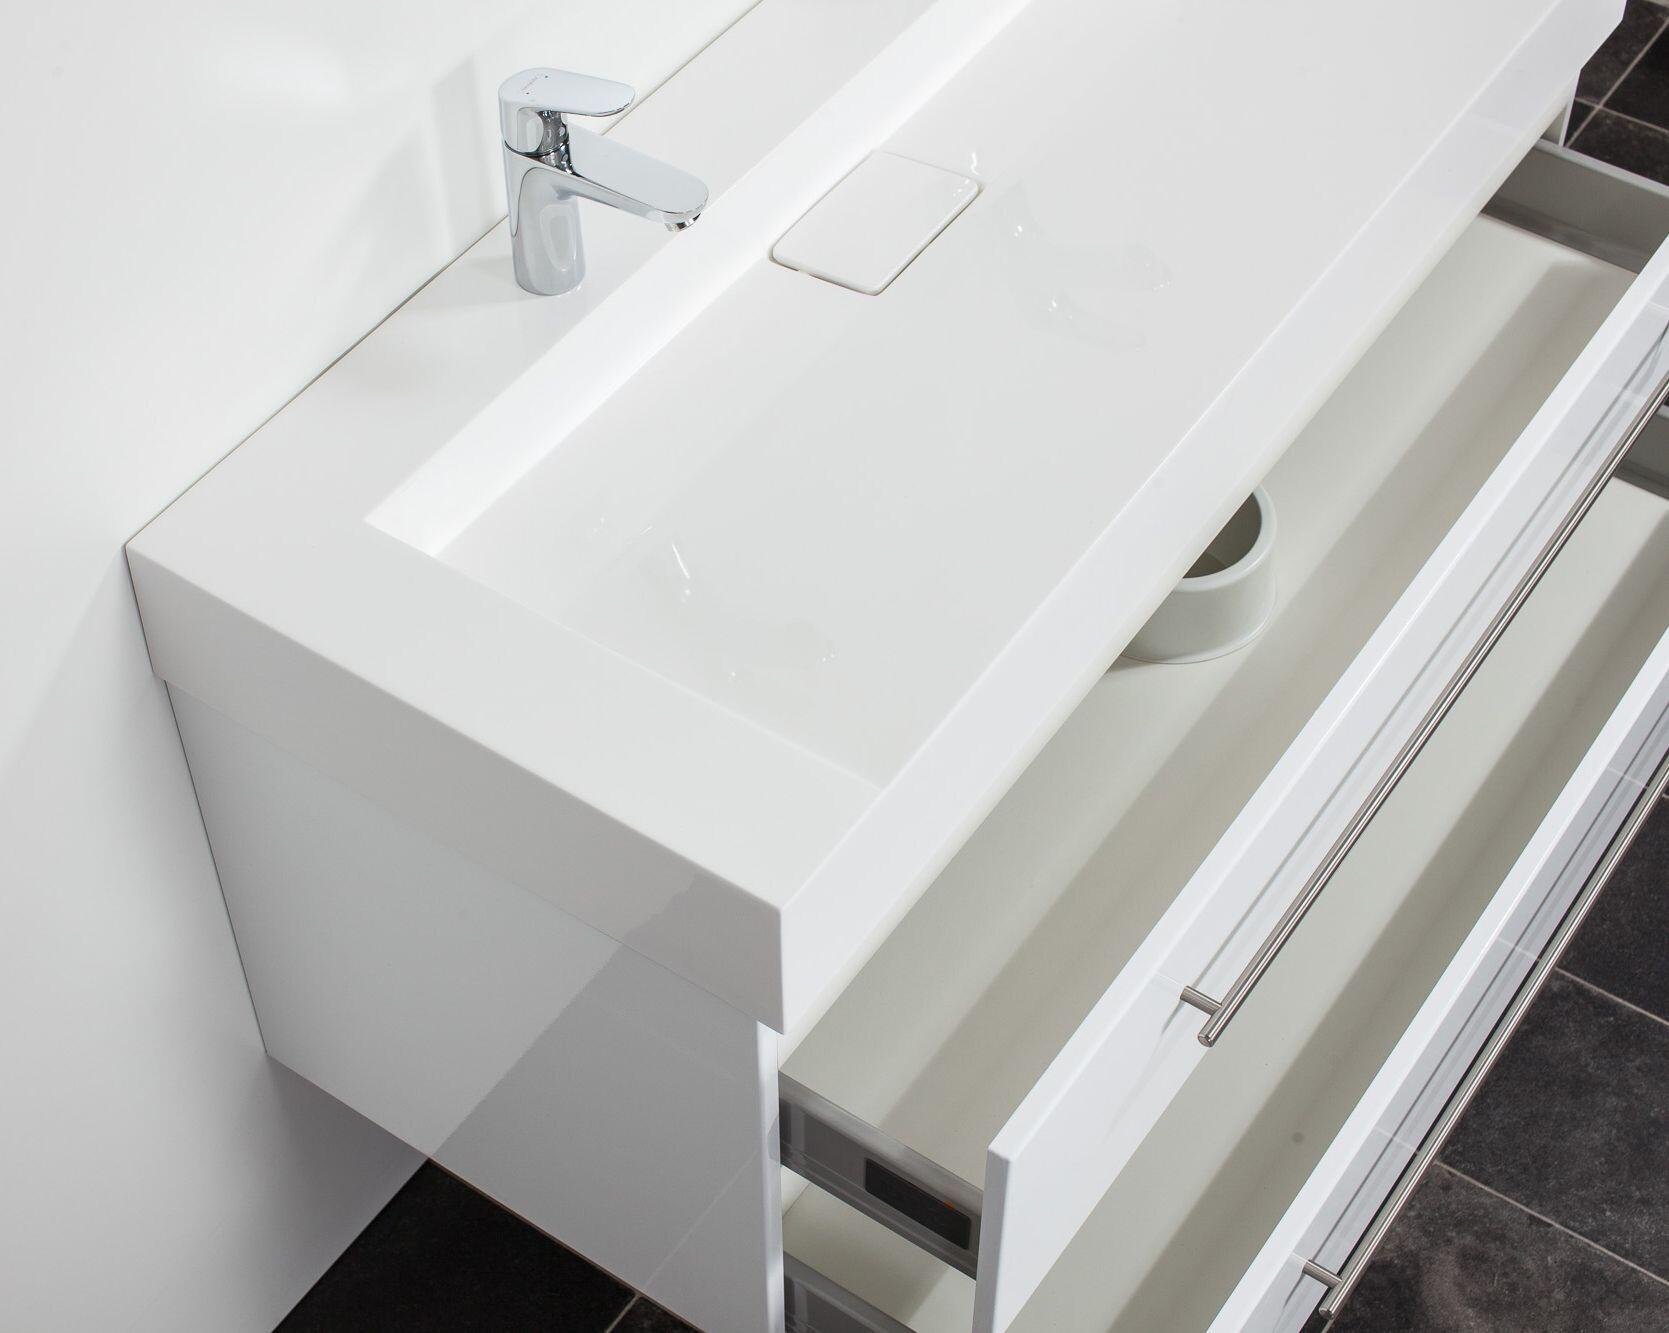 saniclear design wastafelmeubel 120cm 2 kranen hoogglans wit bs5084